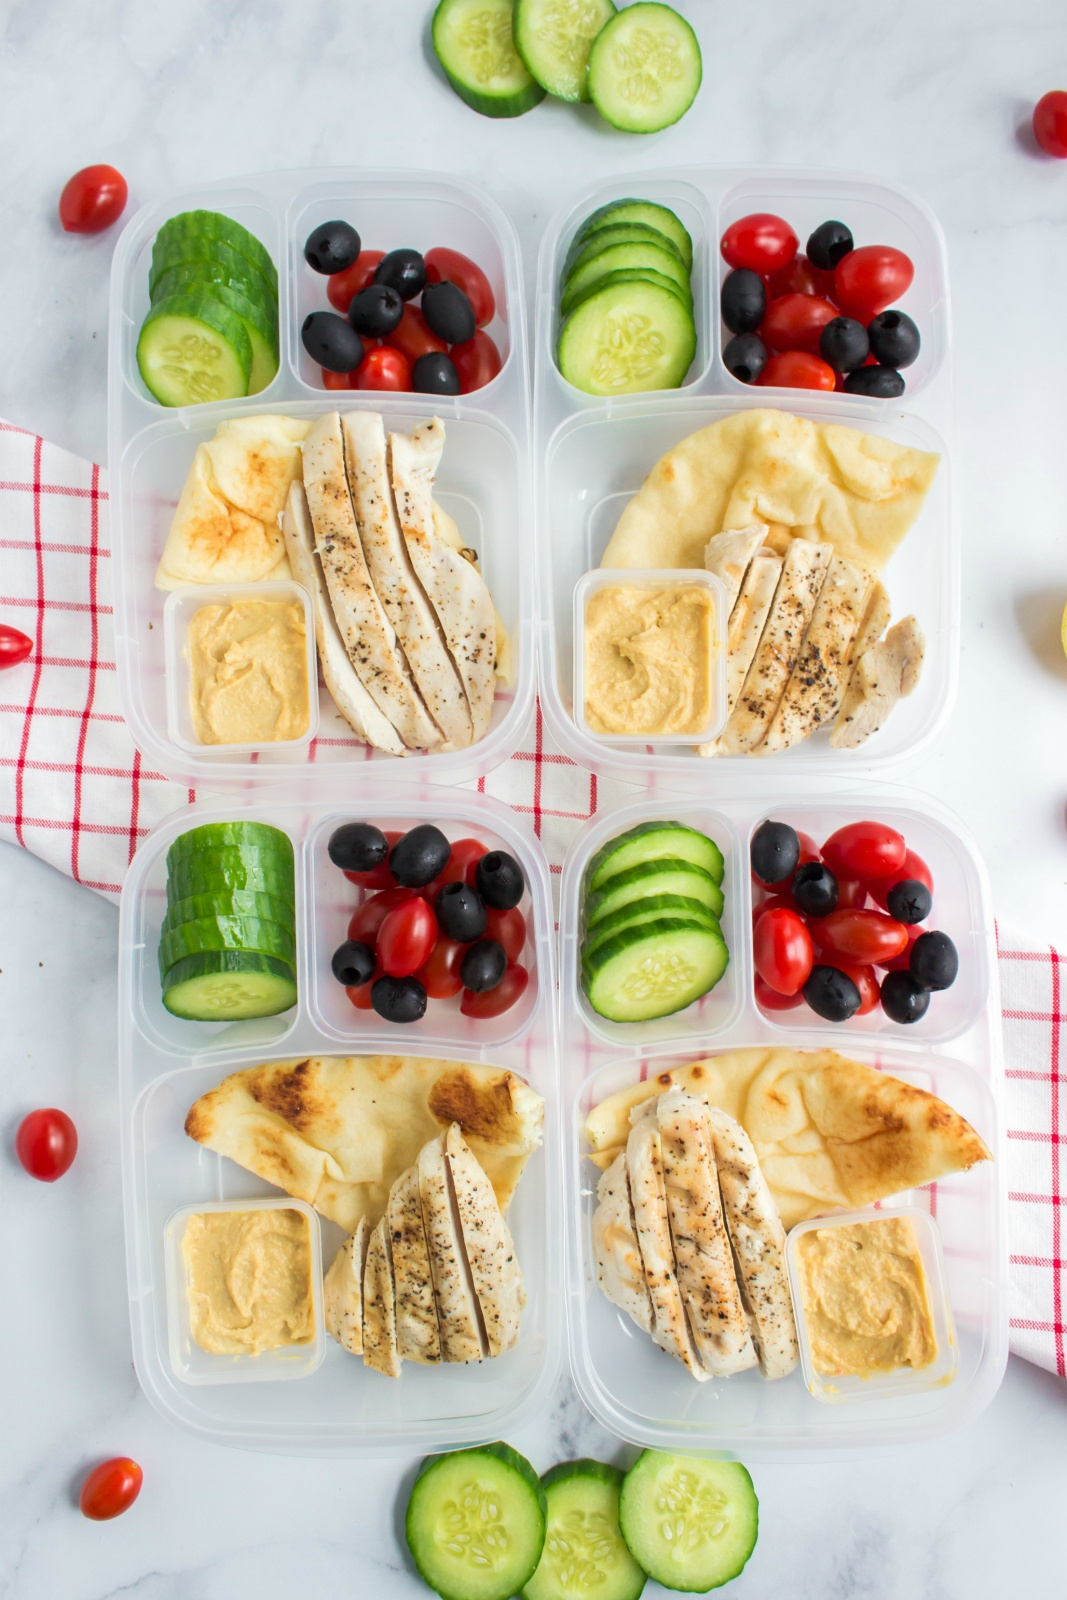 Easy Mediterranean Lunchbox Idea #easylunchboxes #healthy #hummus #familyfreshmeals #lunchbox via @familyfresh